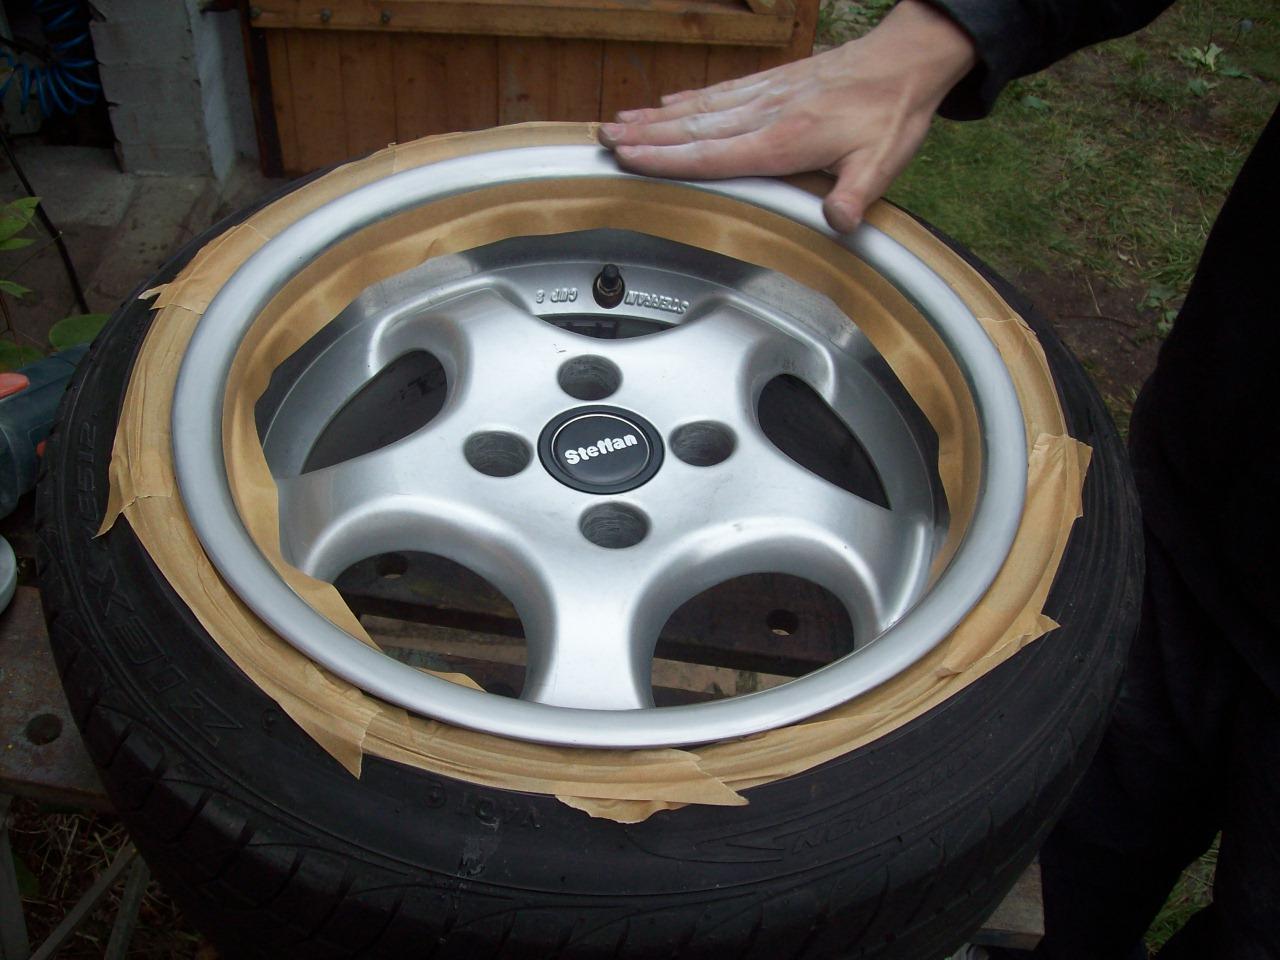 auto selber polieren auto polieren so wirds richtig. Black Bedroom Furniture Sets. Home Design Ideas